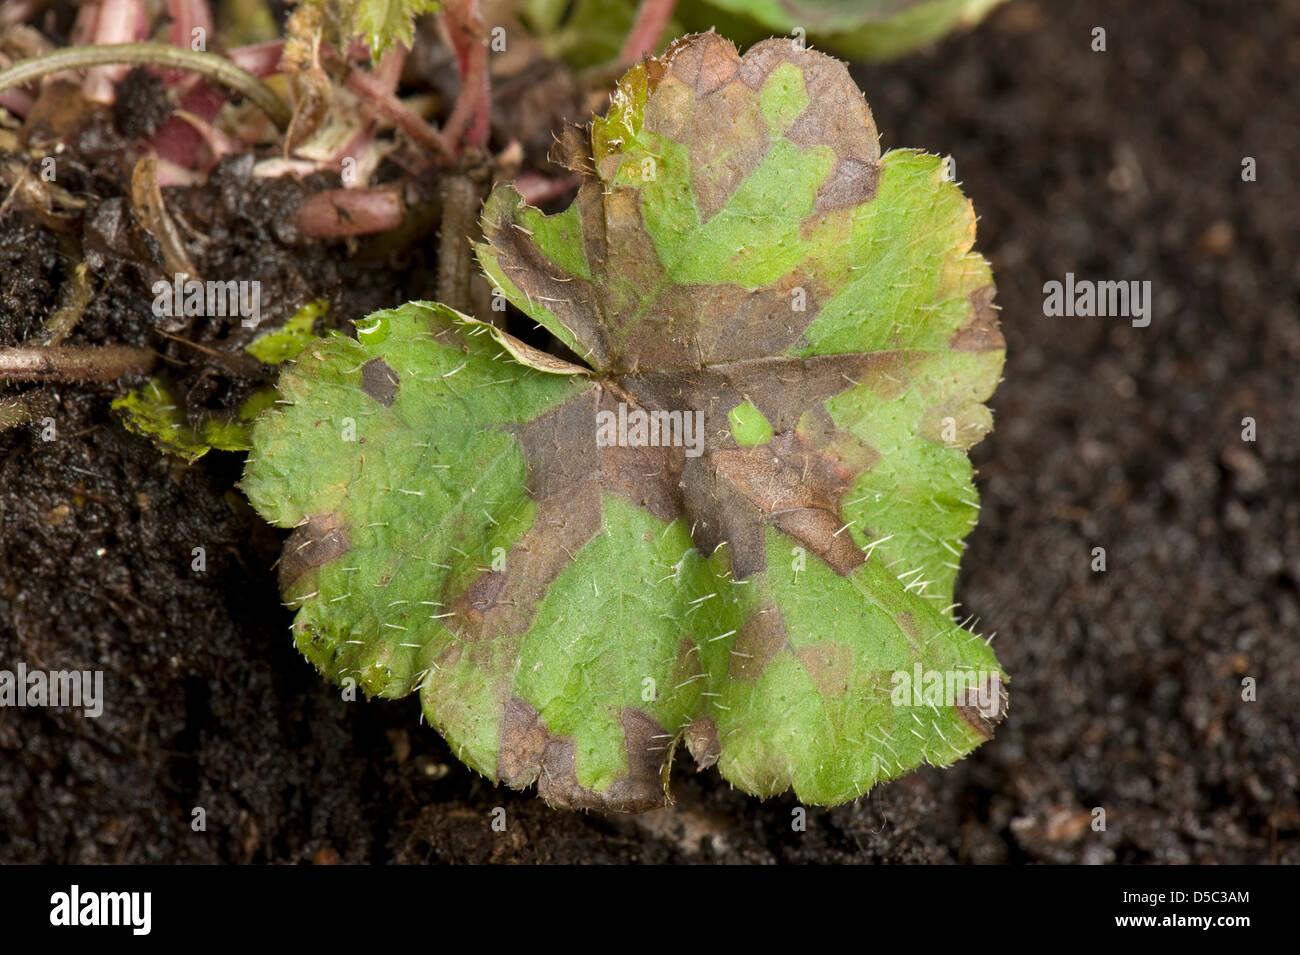 Foliar nematode, Aphelenchoides spp, angular leaf spotting on an ornamental anemone plant leaves - Stock Image